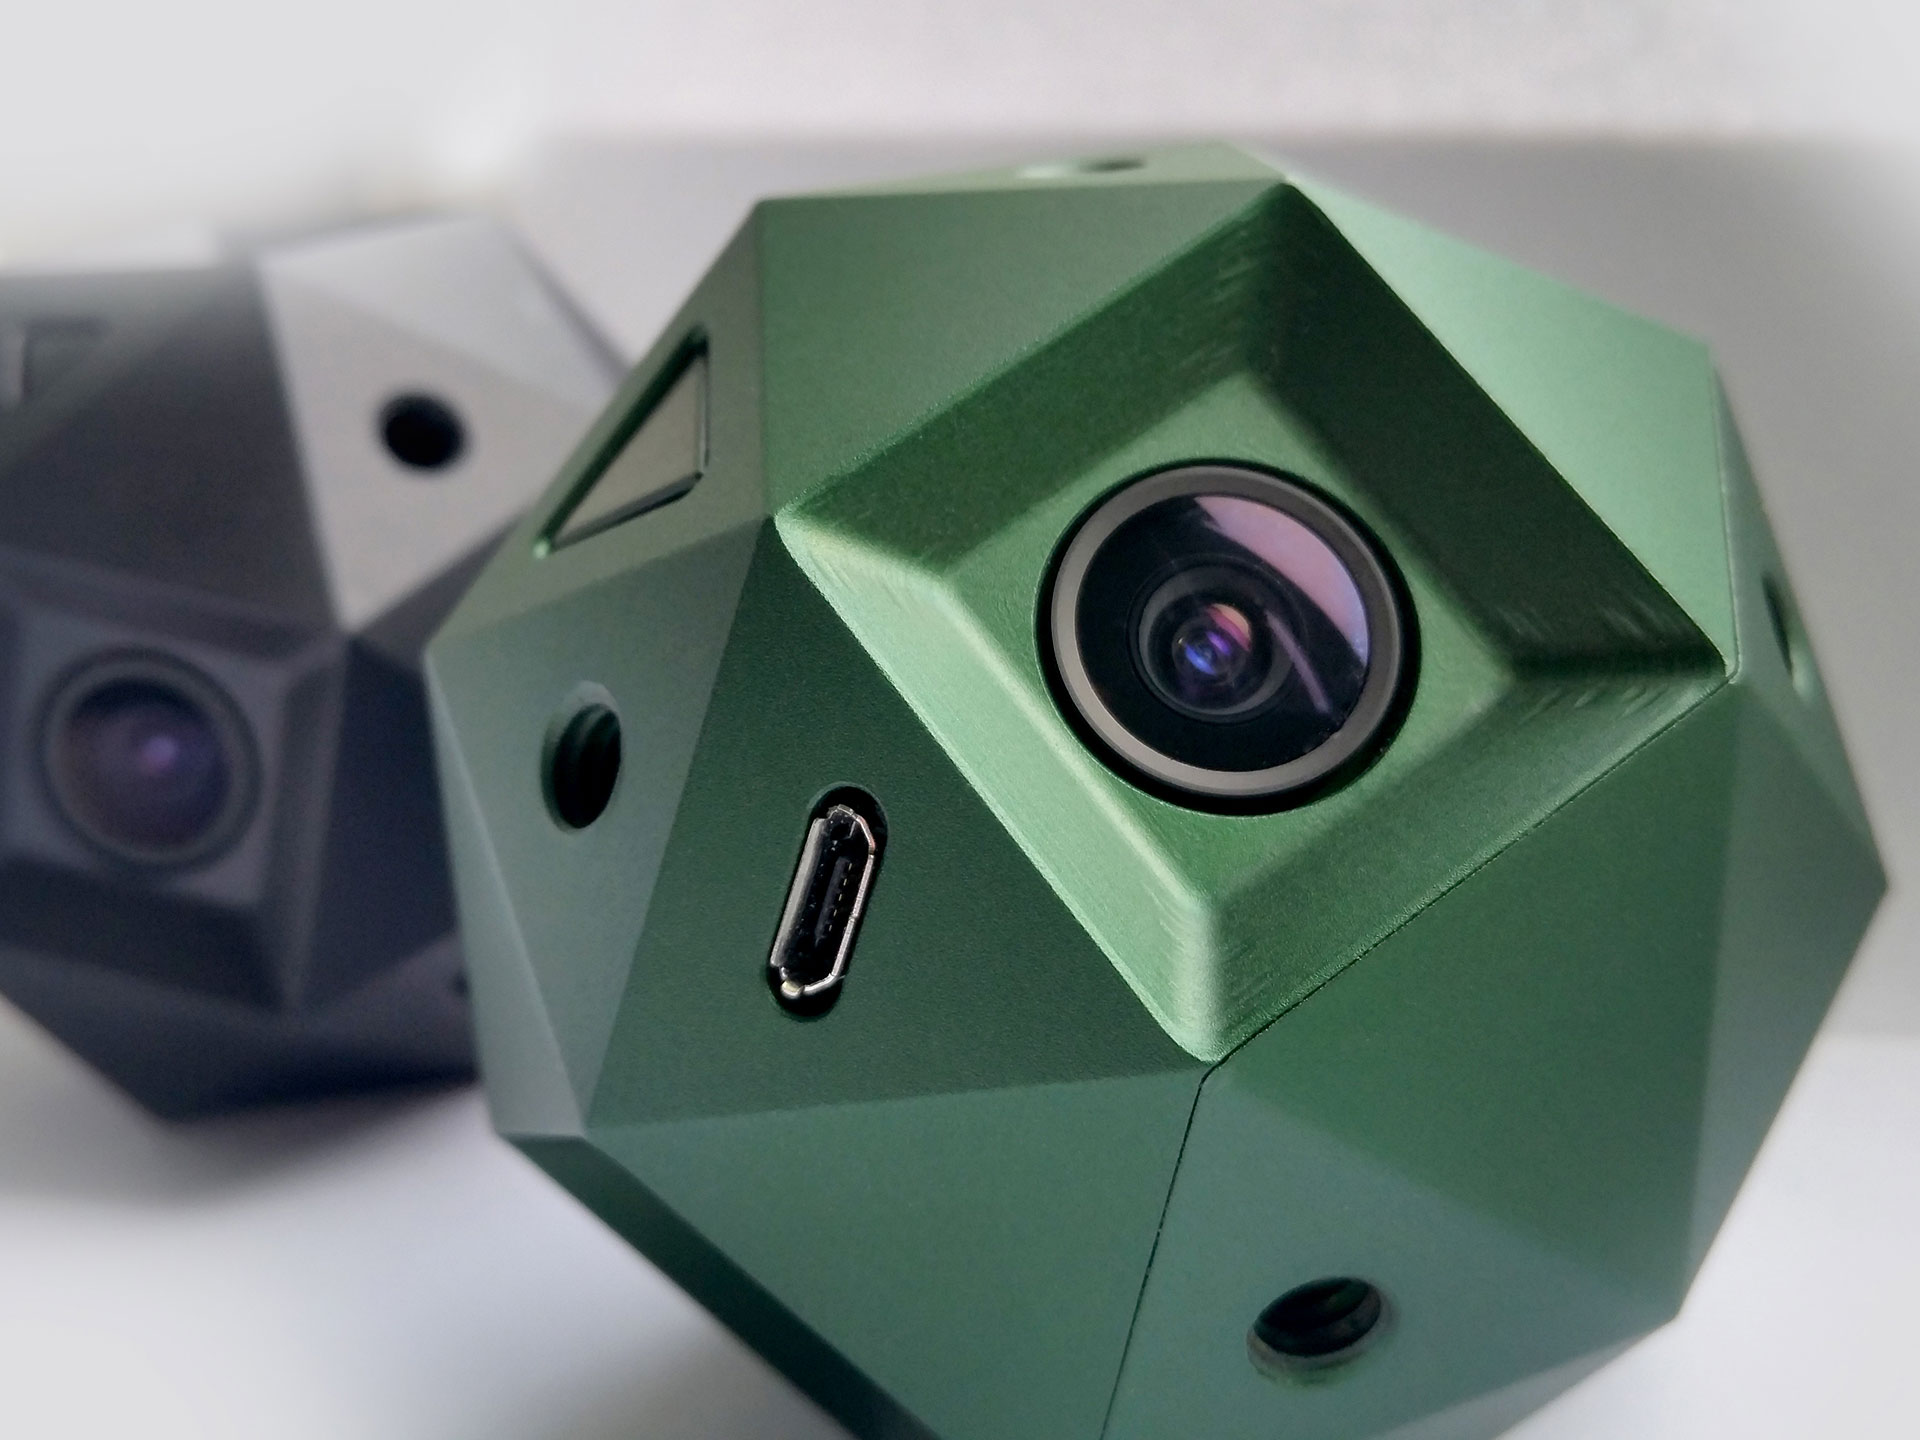 360 Degree 4K Spherical Camera_Online Camera